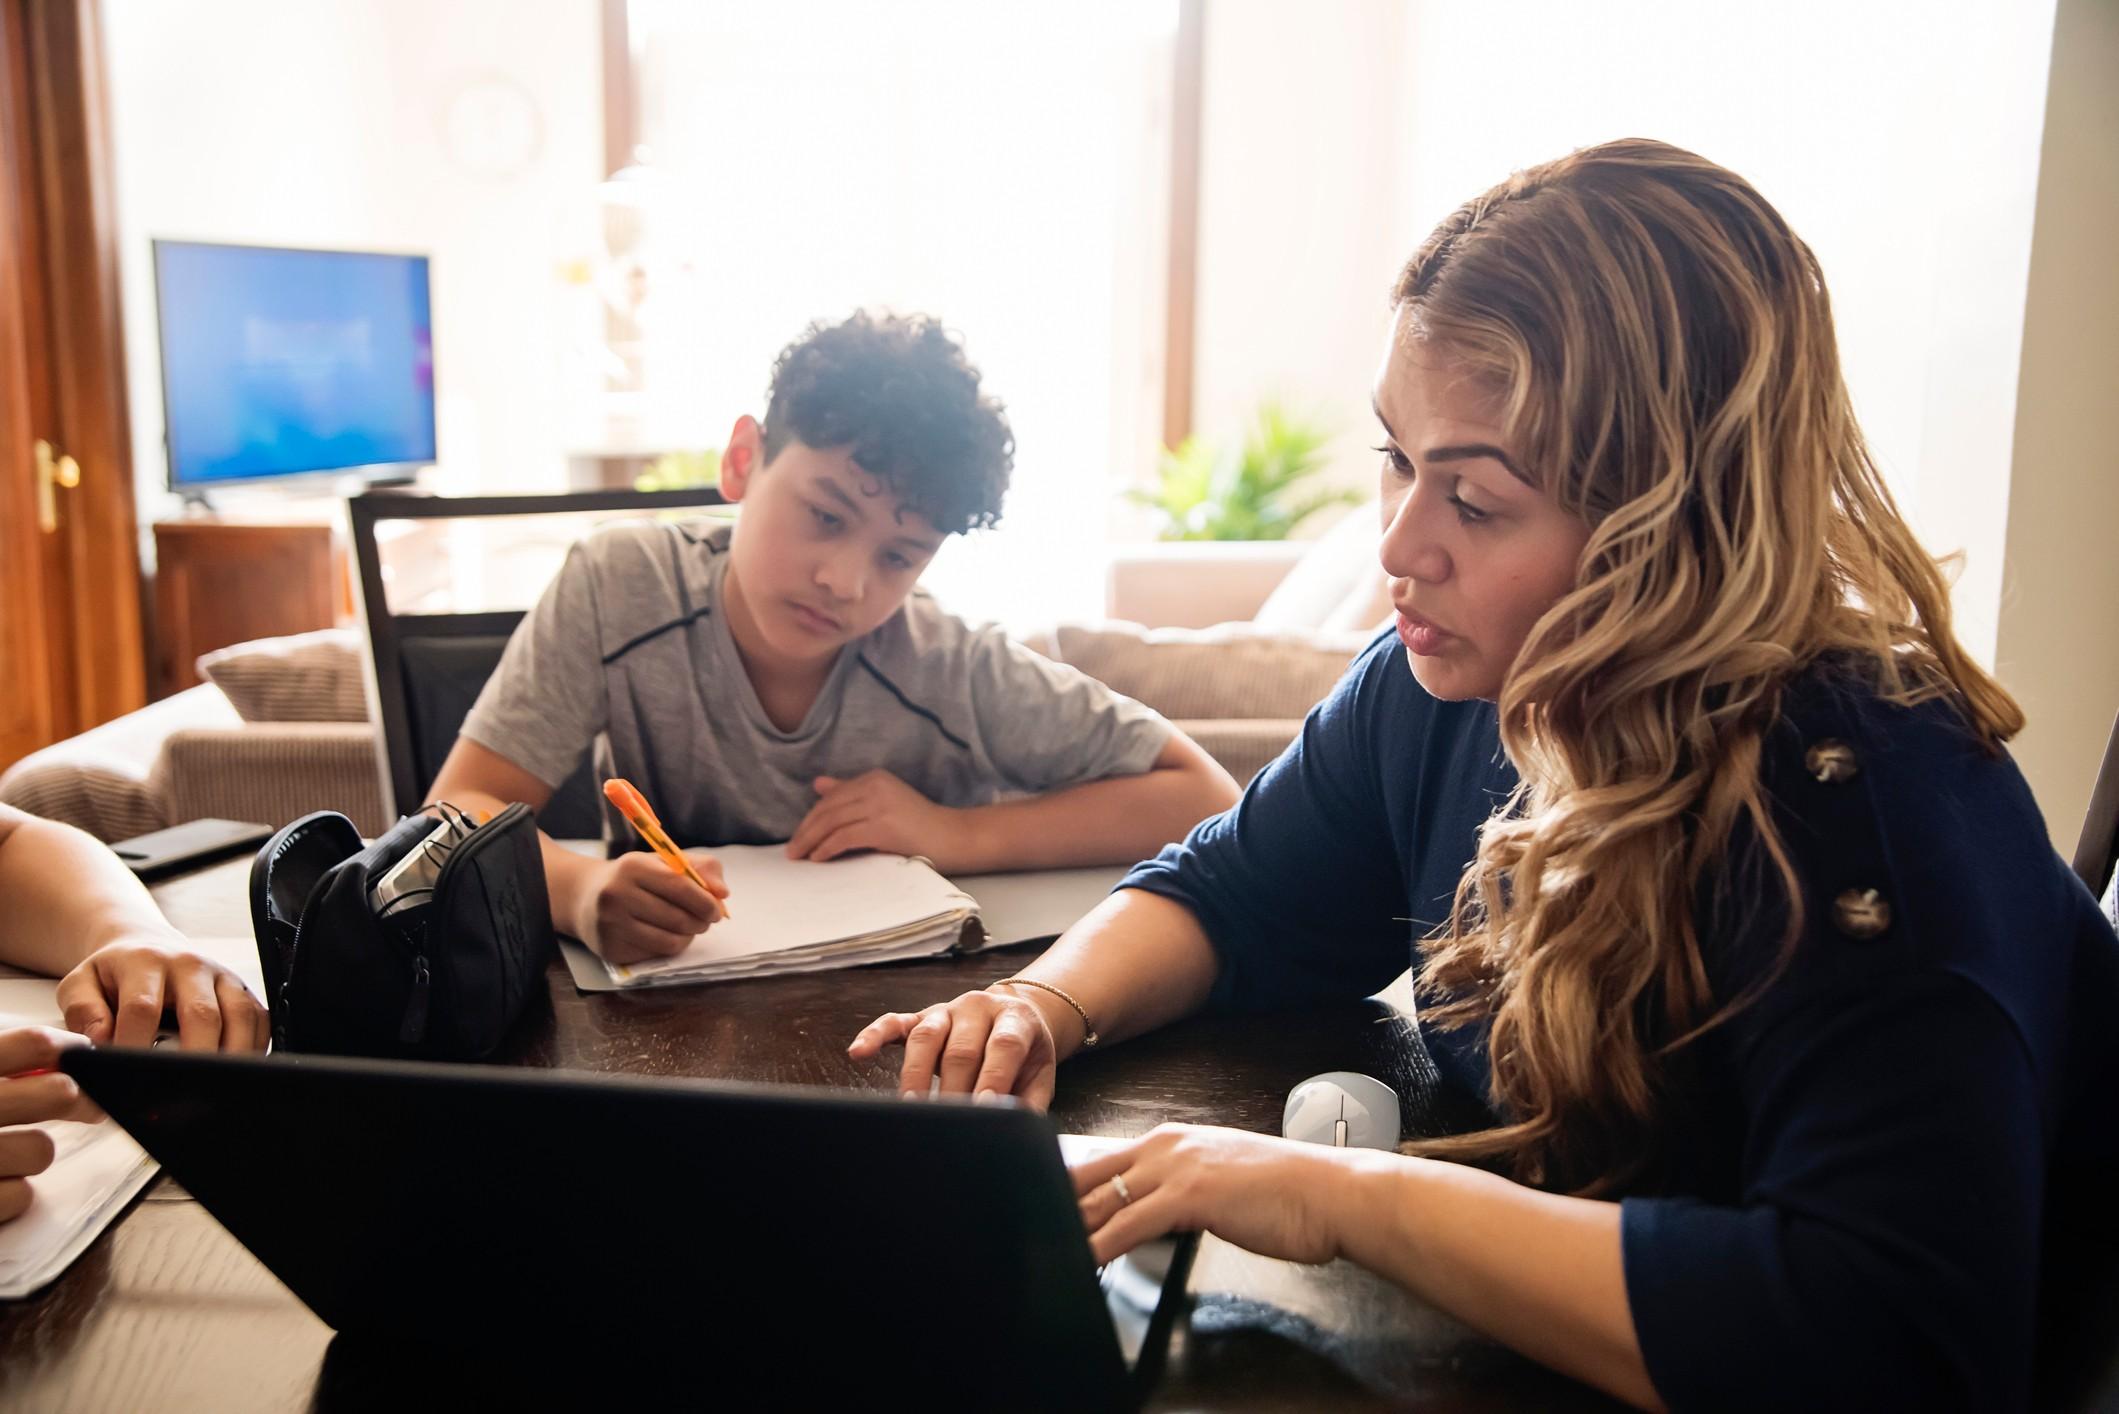 Mother homeschooling her son